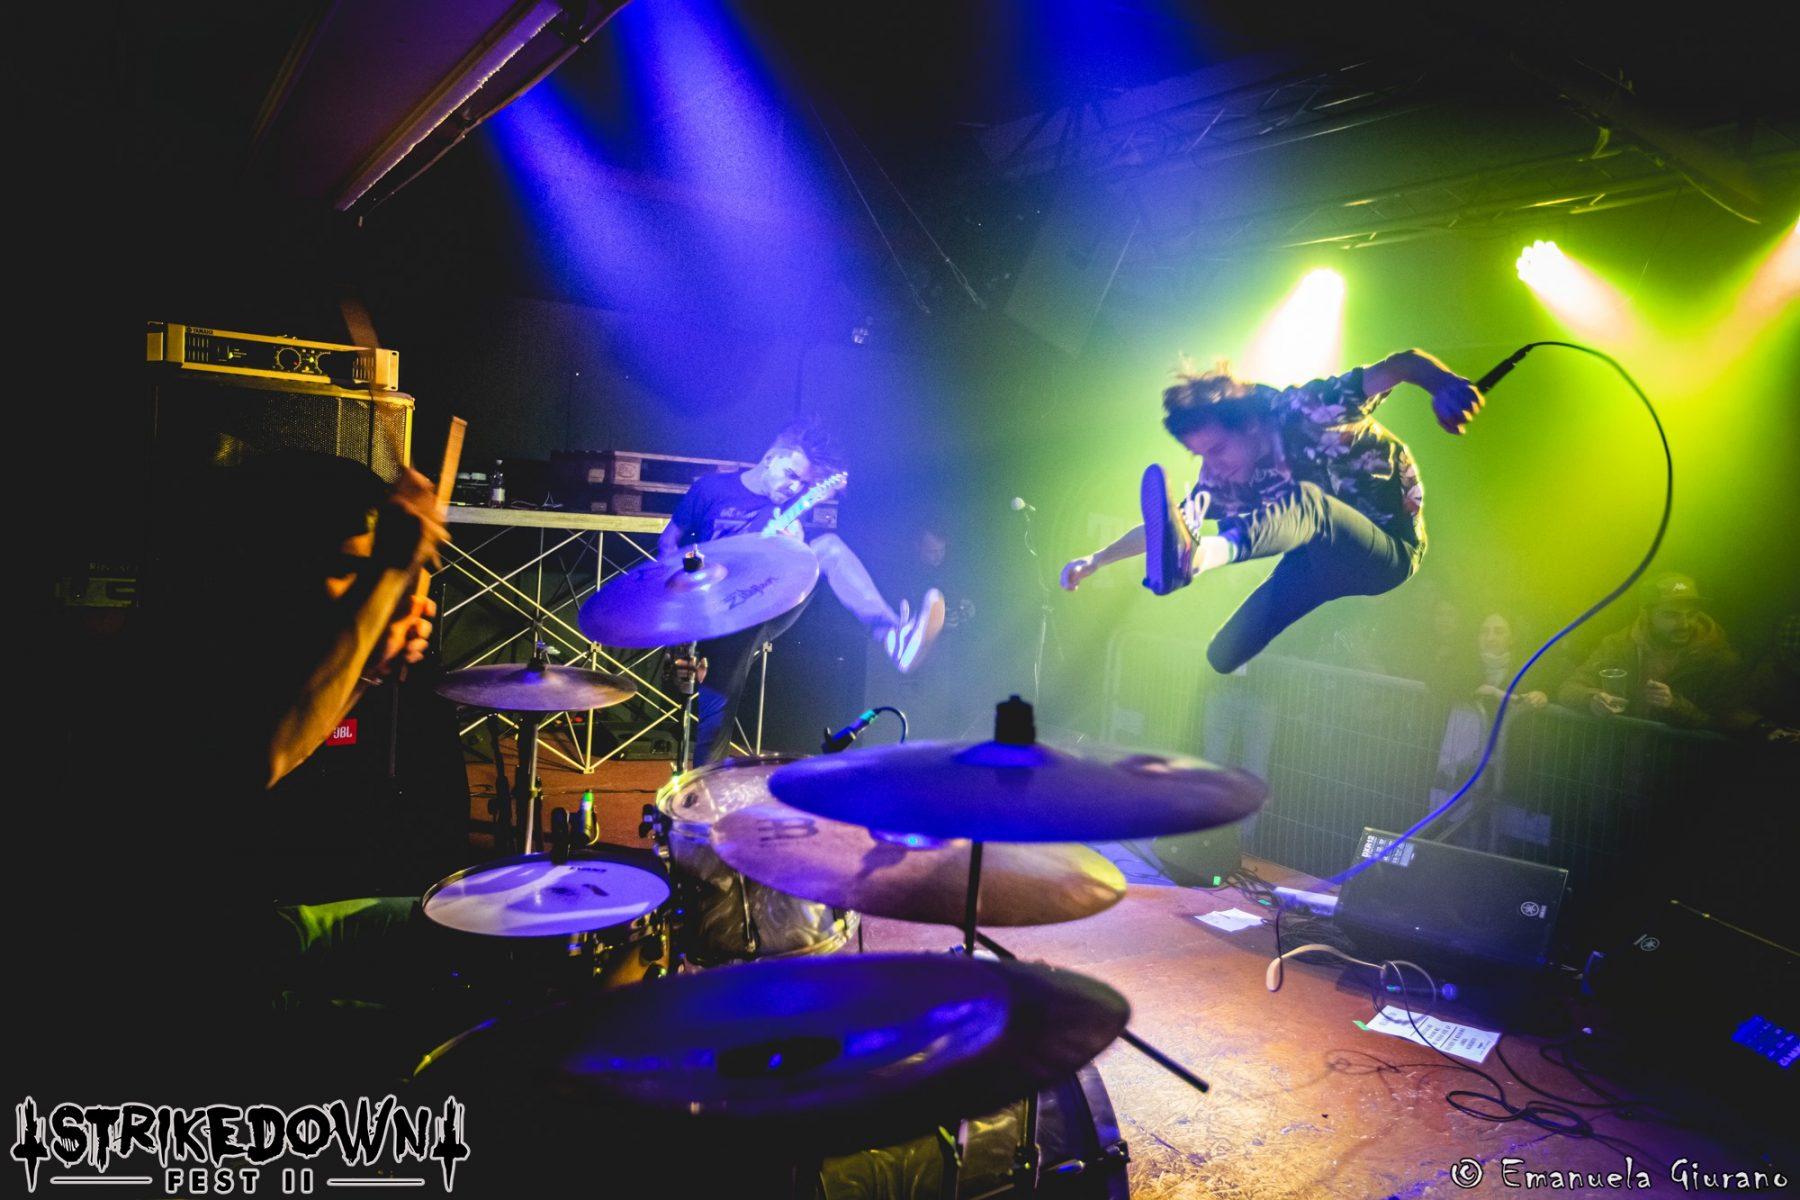 Regrowth - Strikedown Fest - Strikedown Festival Collective - Emanuela Giurano - Cueva Rock - 2020 - Sa Scena Sarda